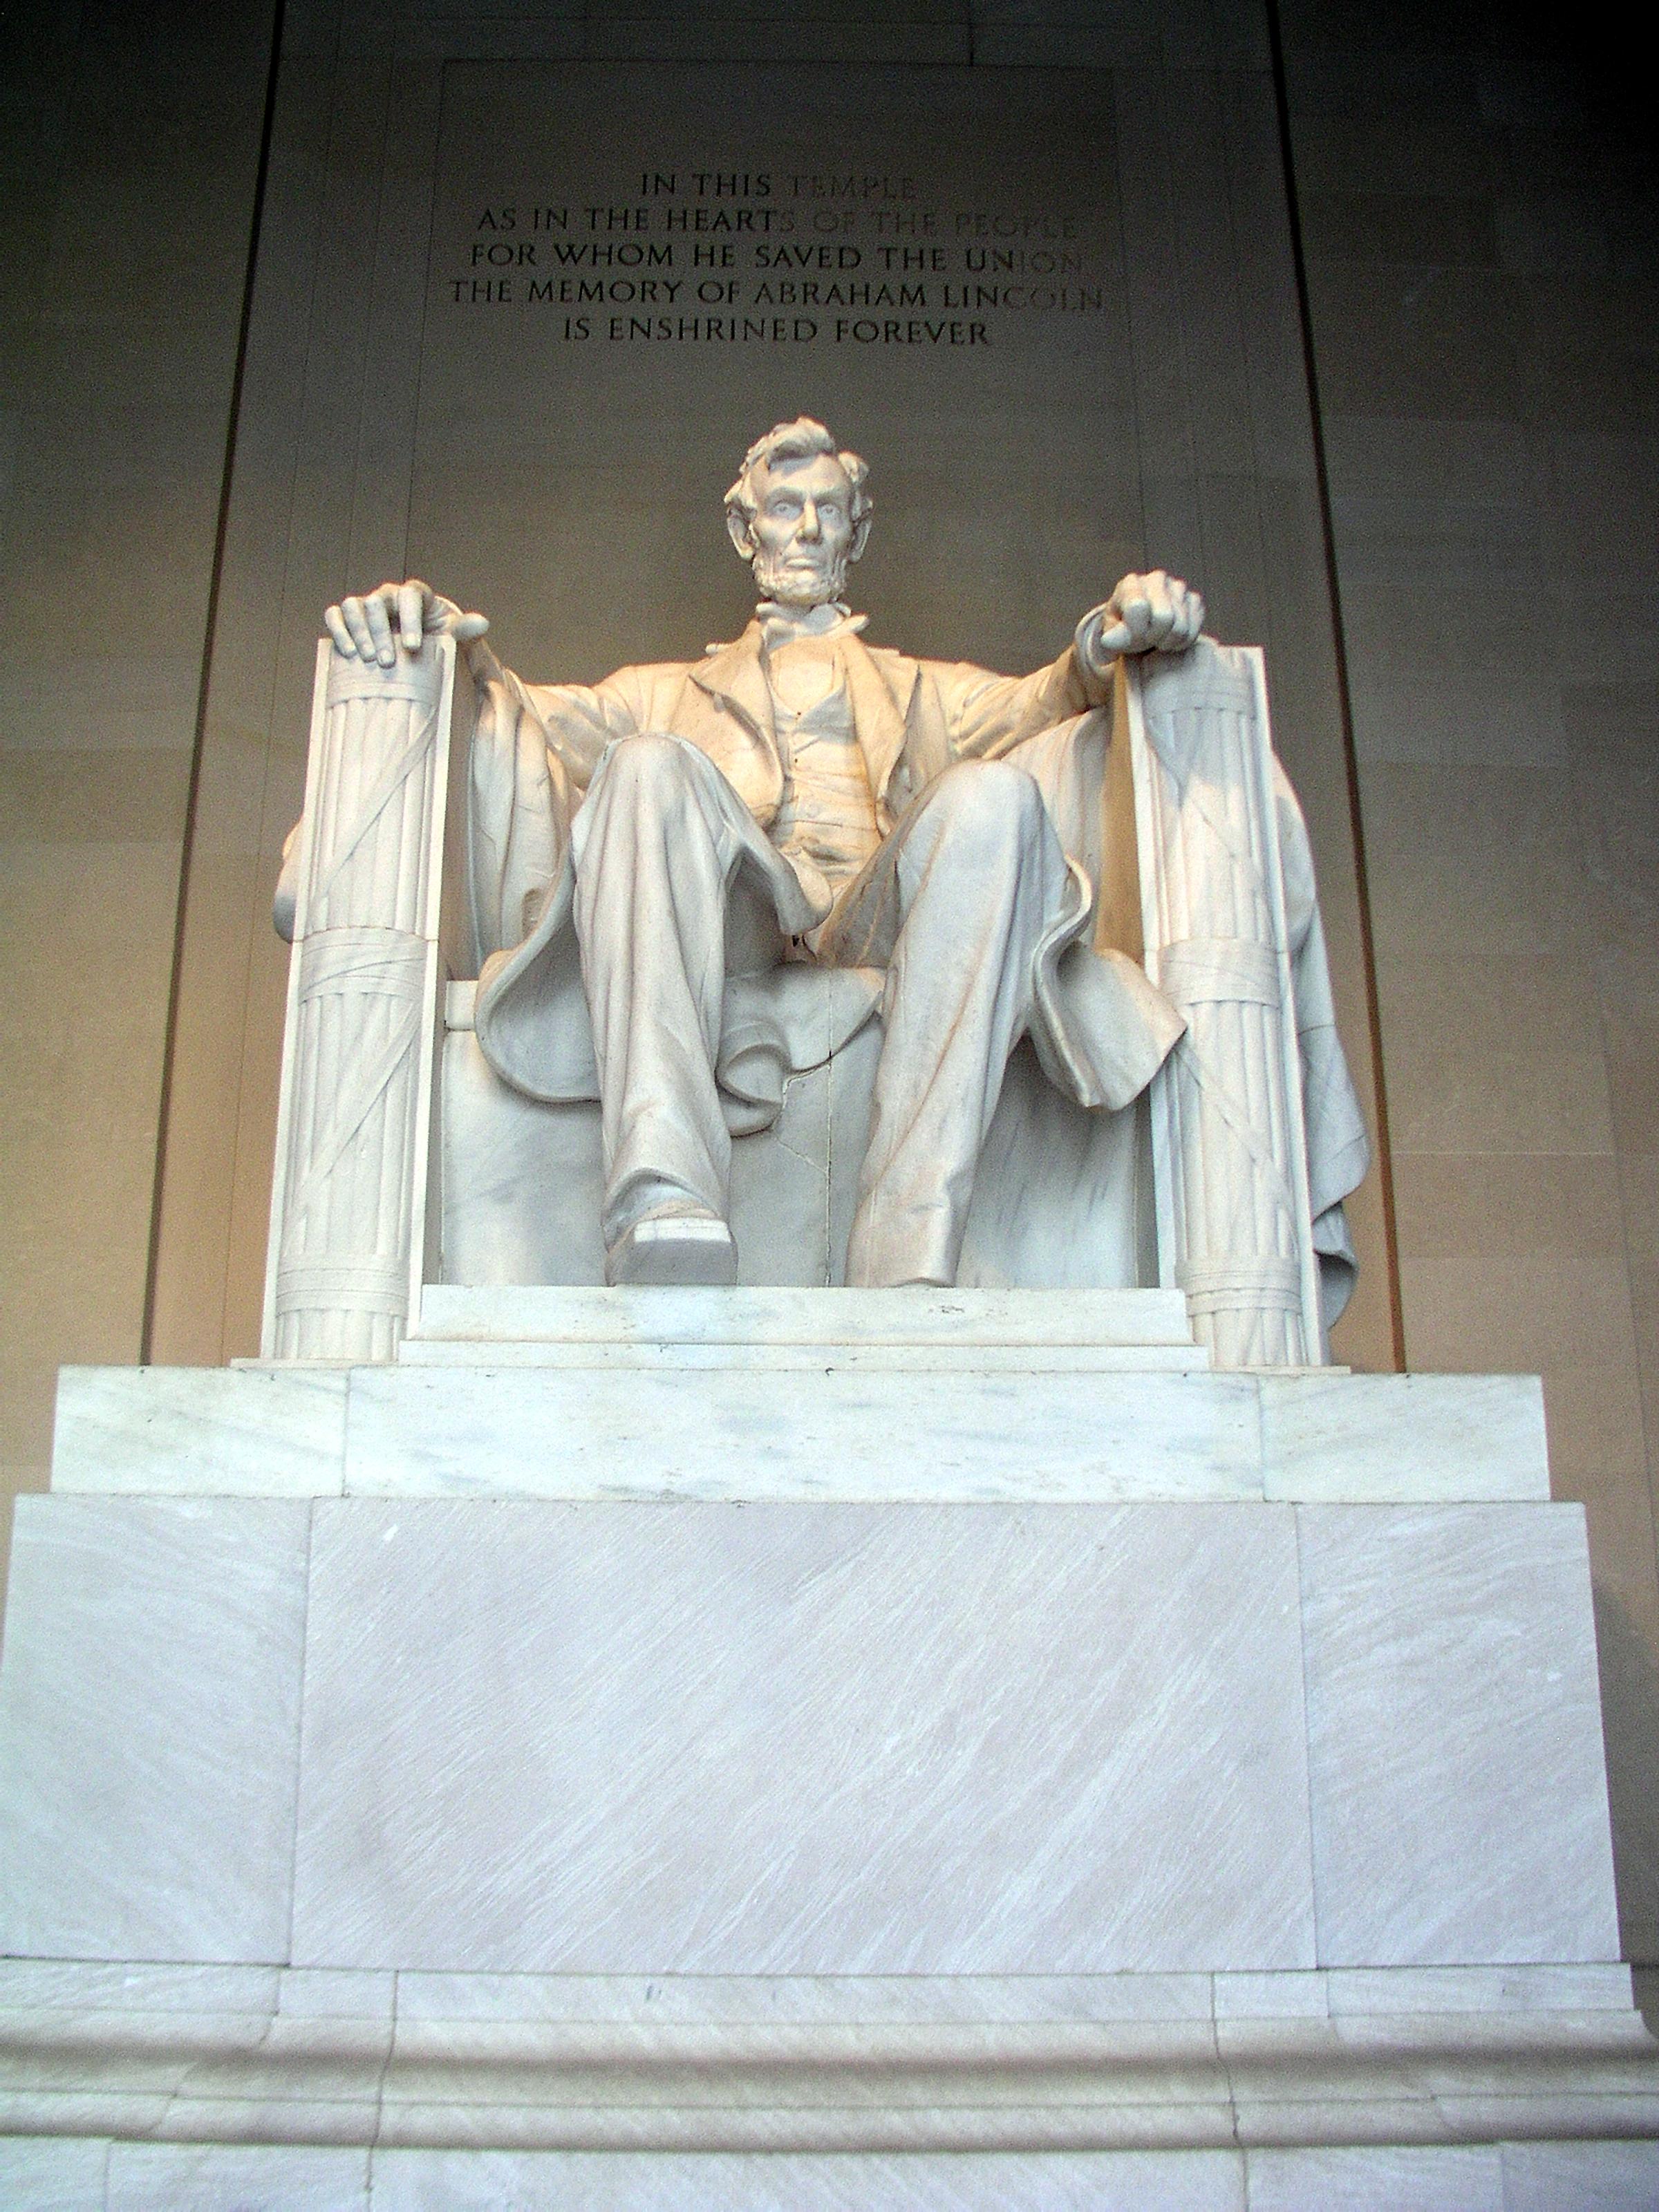 Spitzname Lincolns